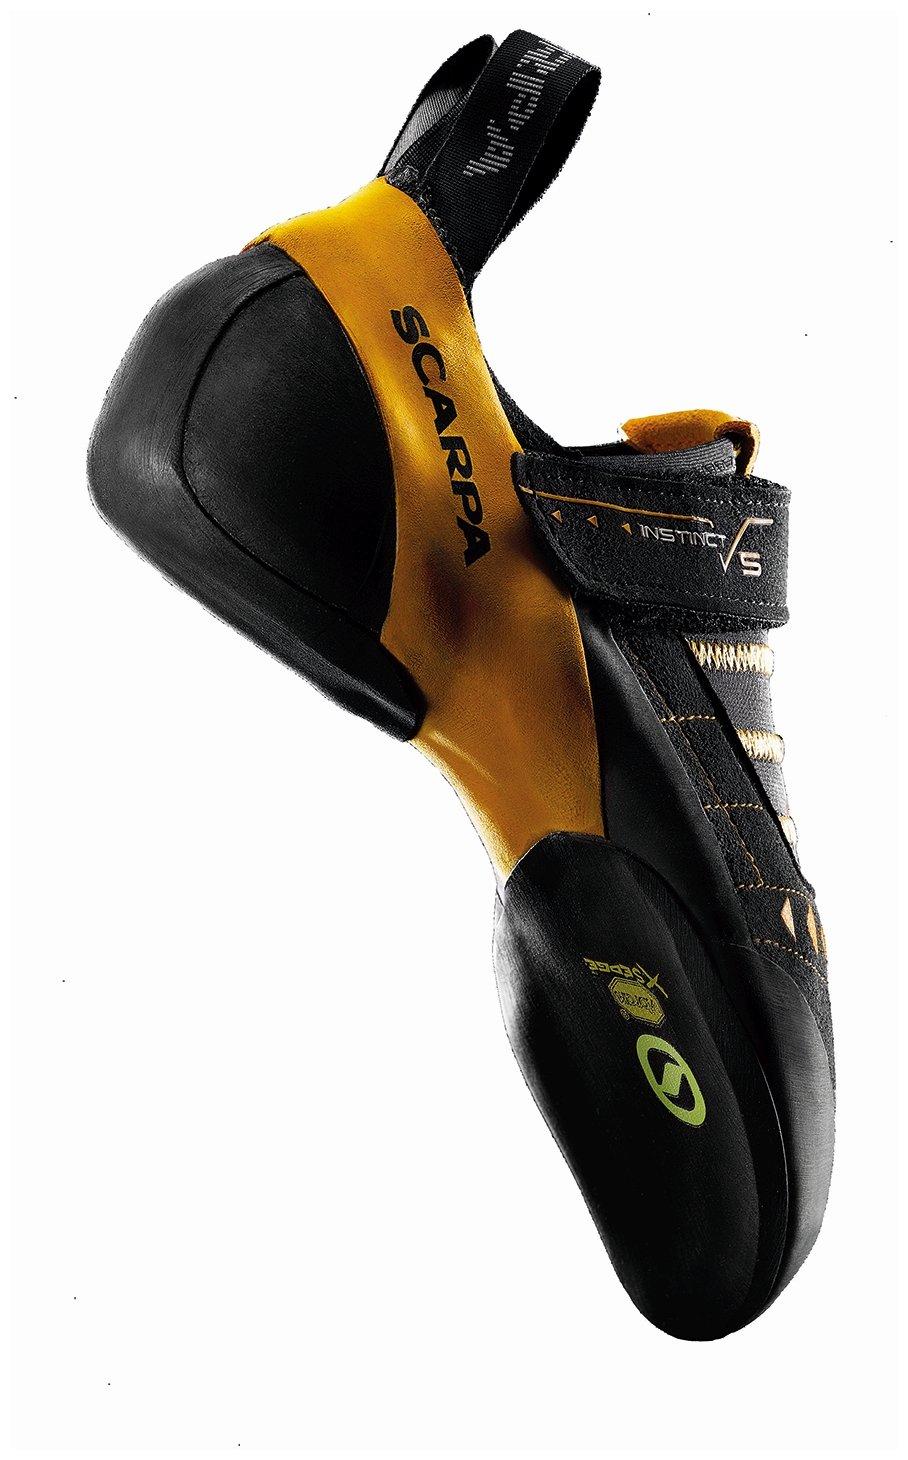 SCARPA Instinct VS Climbing Shoe-U, Black/Orange, 46 EU/12 M US by SCARPA